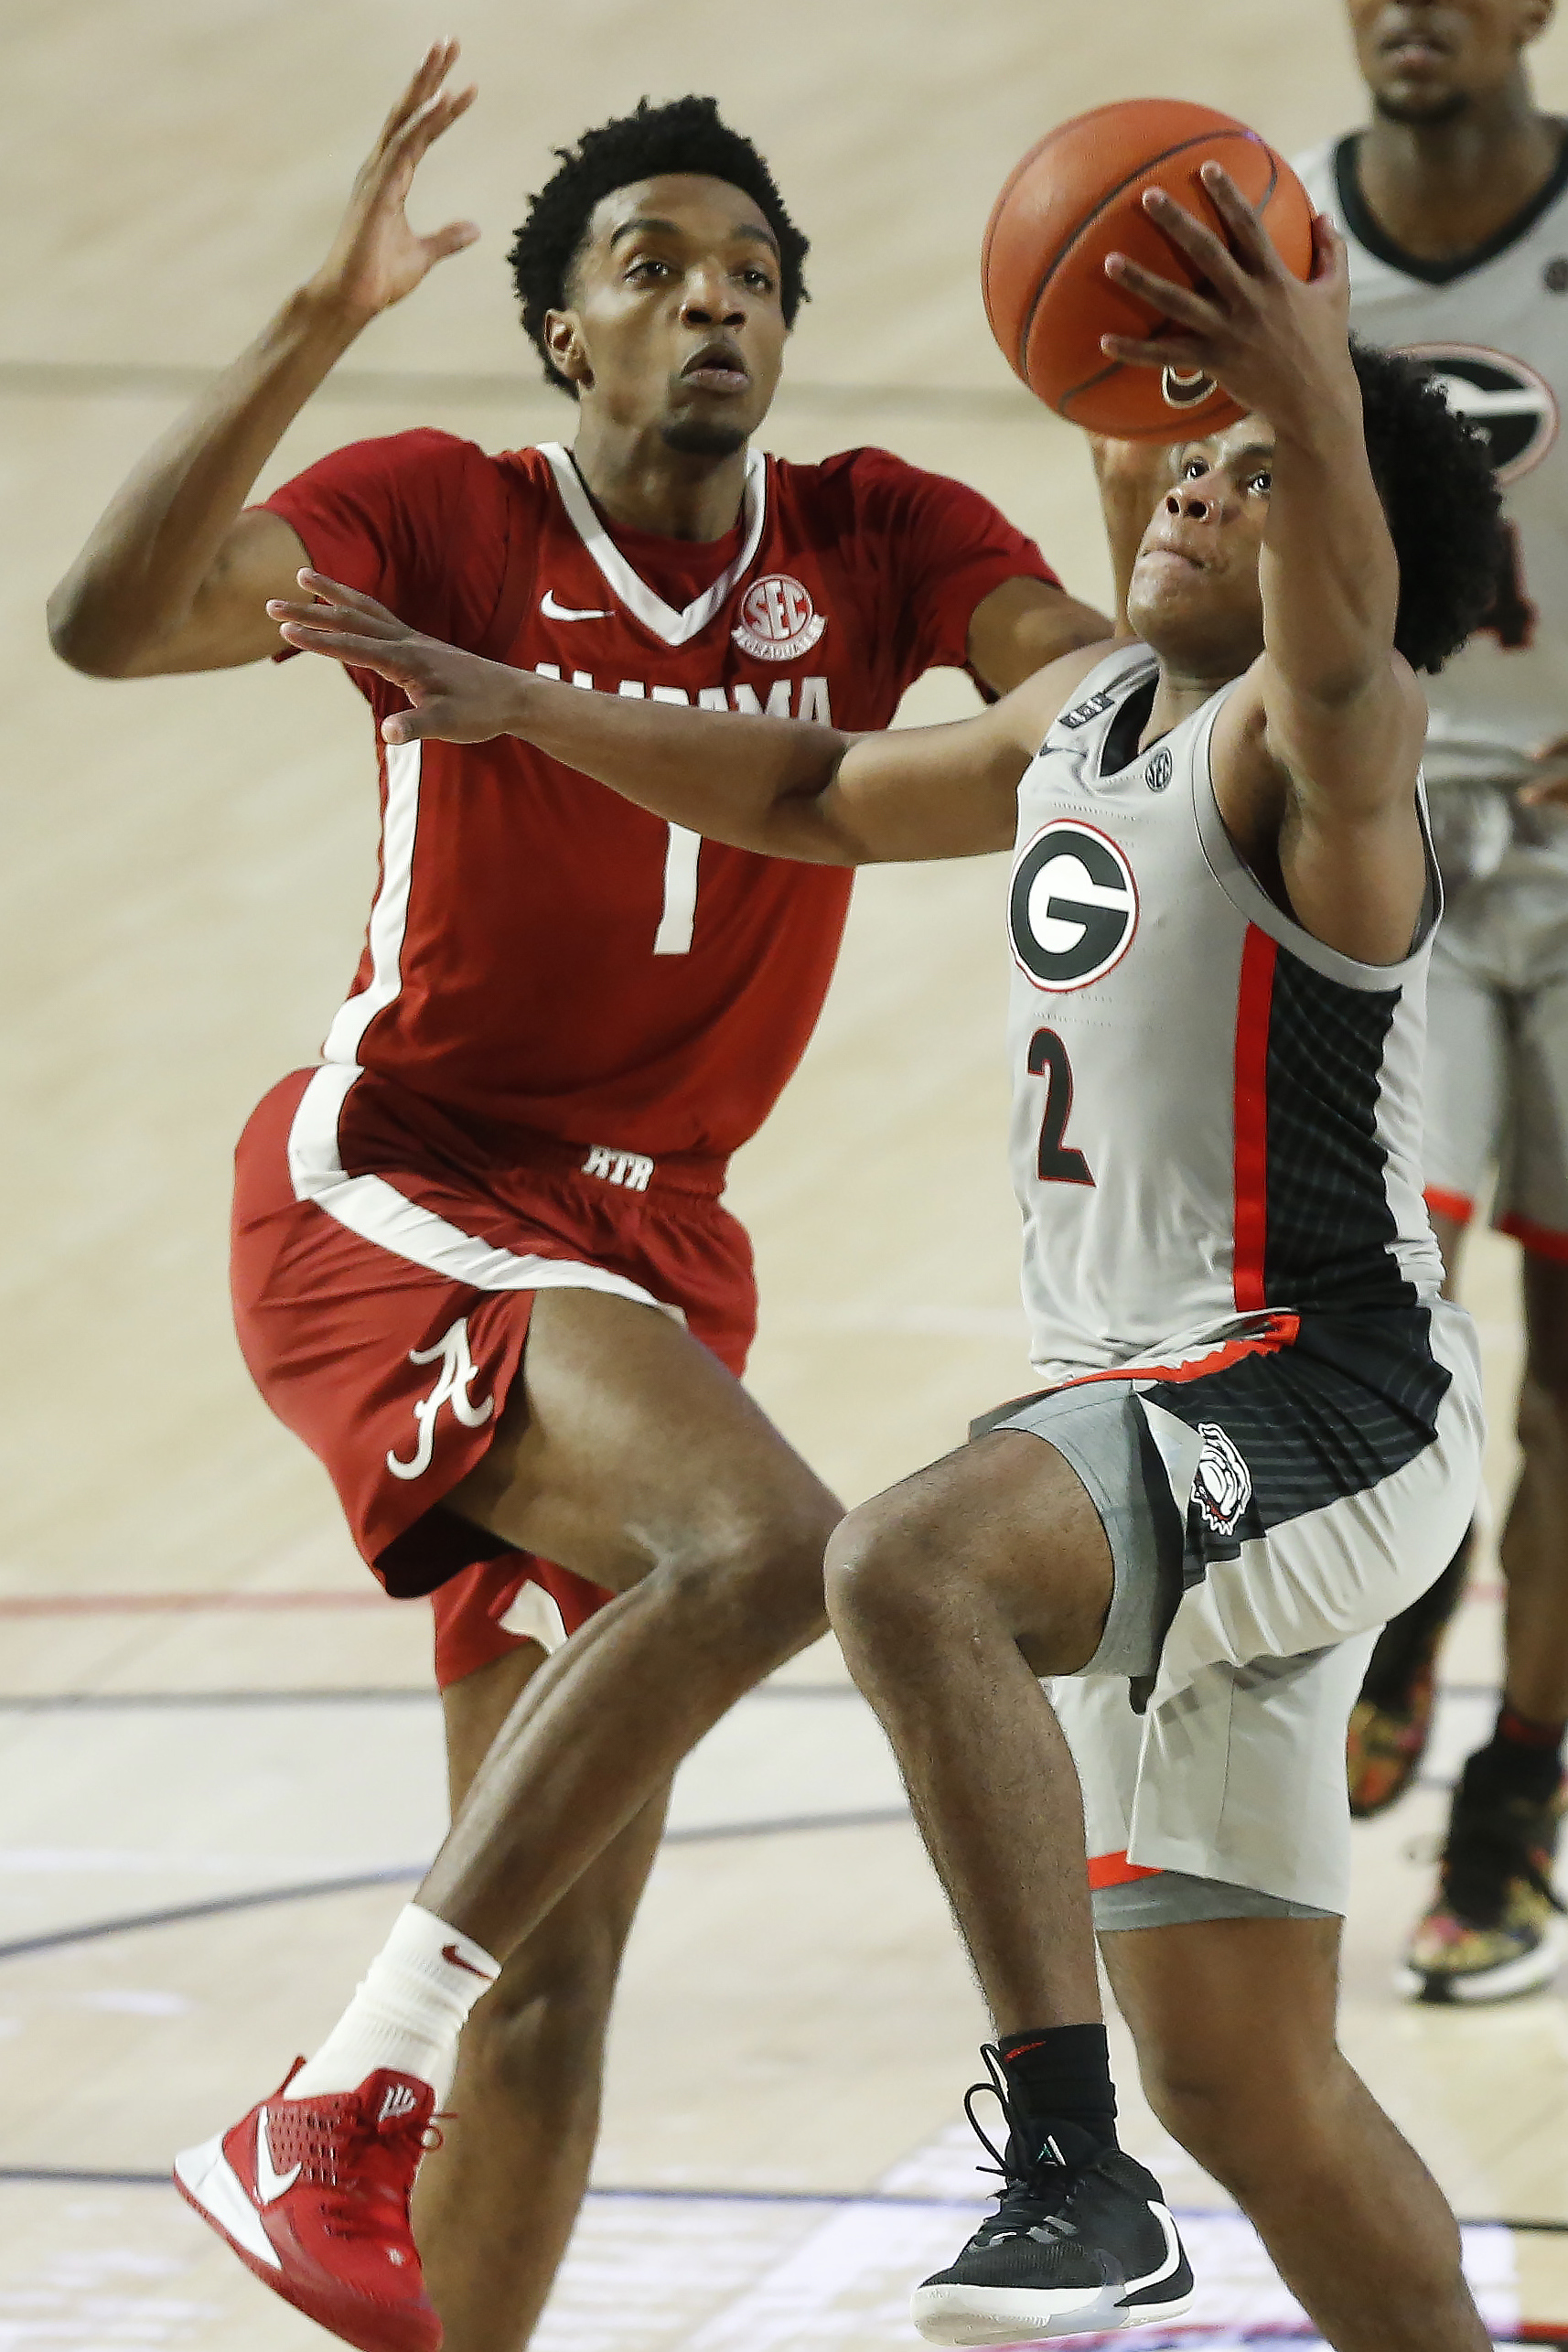 "<p zoompage-fontsize=""15"" style="""">NCAA Basketball: Alabama at Georgia"